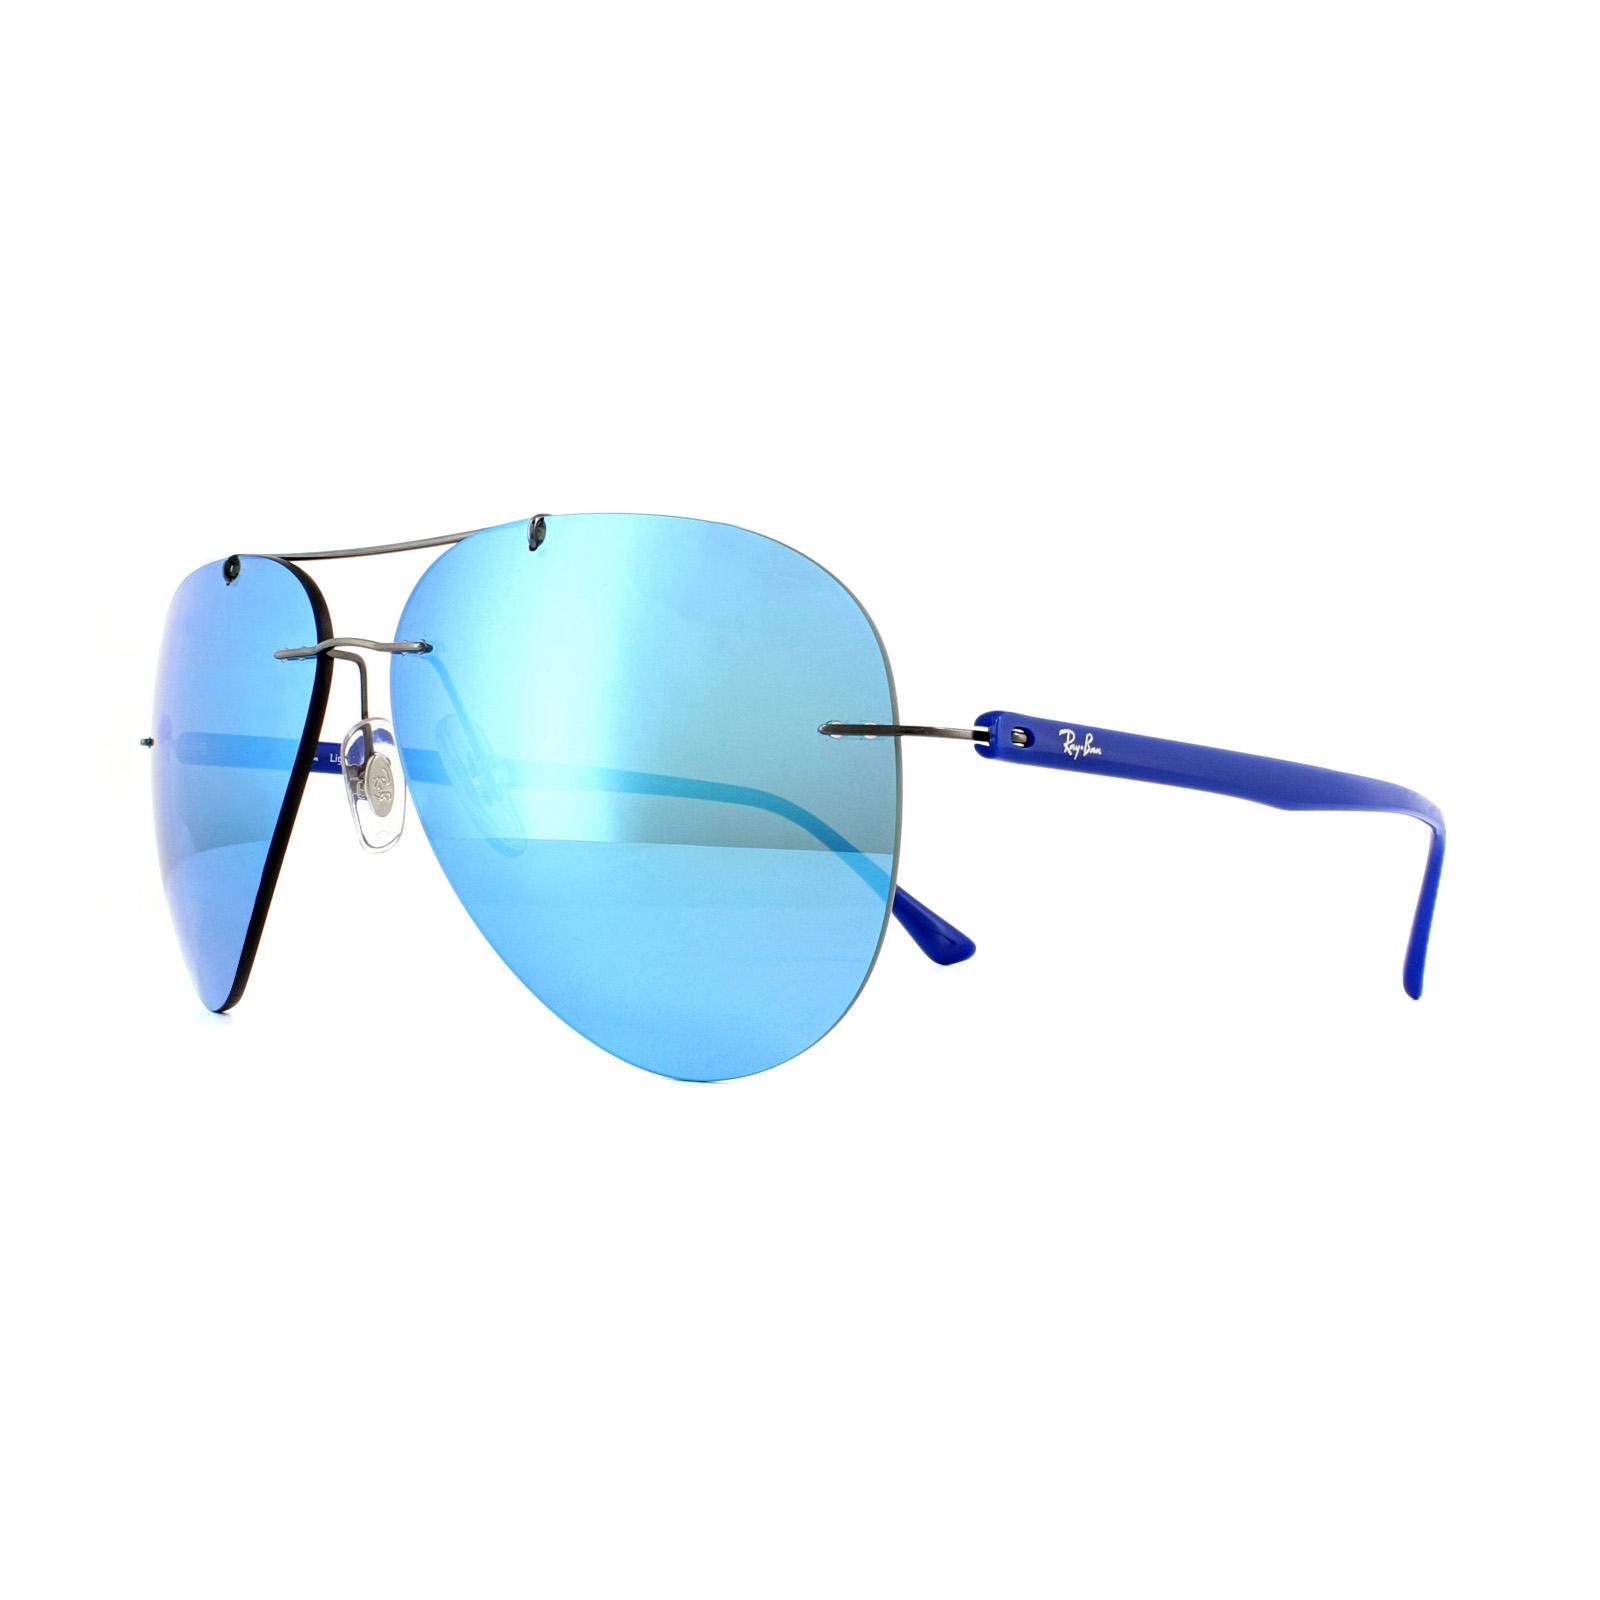 9cbc8933634 Sentinel Ray-Ban Sunglasses 8058 004 55 Gunmetal Blue Mirror. Sentinel  Thumbnail 4